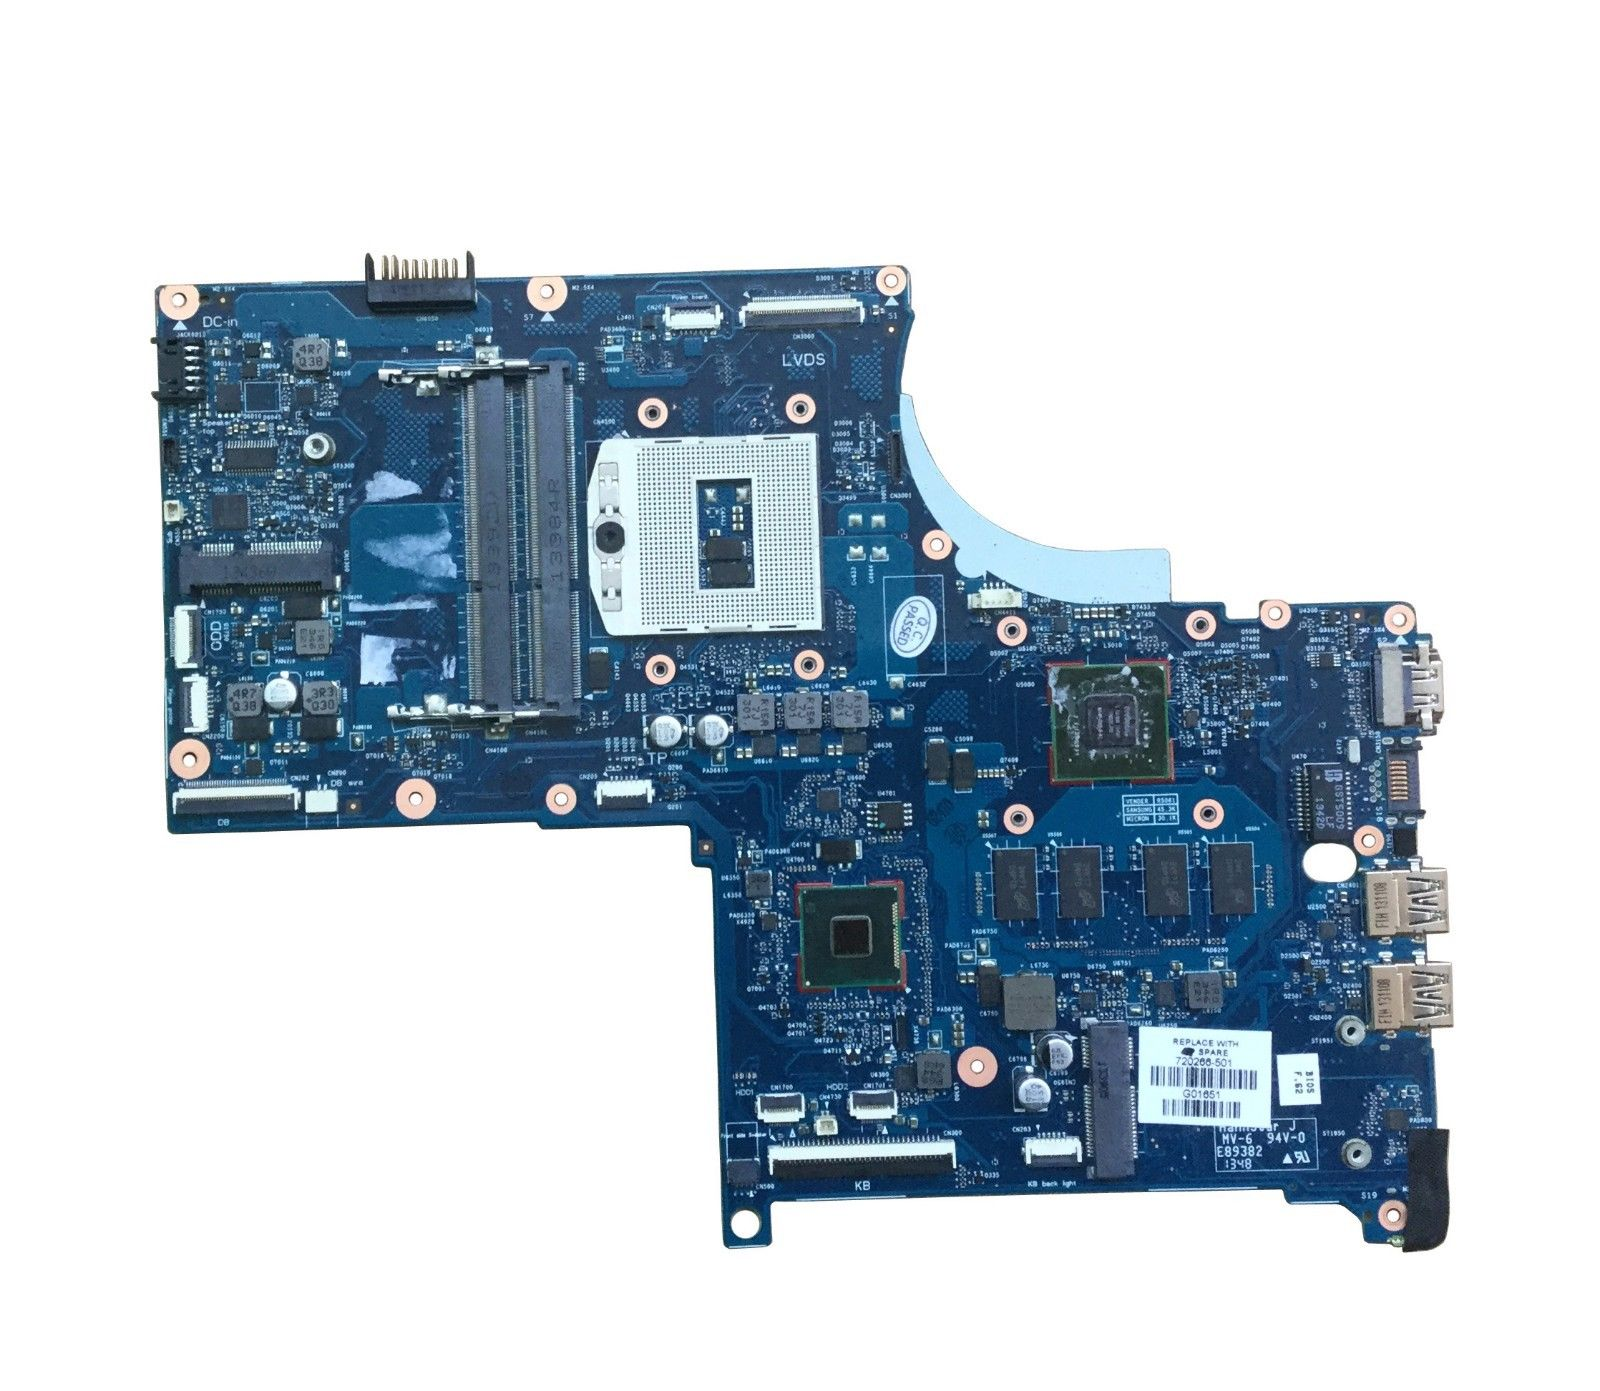 KEFU-اللوحة الأم للكمبيوتر المحمول HP ENVY 17 17-J ، اللوحة الرئيسية الأصلية GT740M 17SBGV2D-6050A2549801-MB-A02